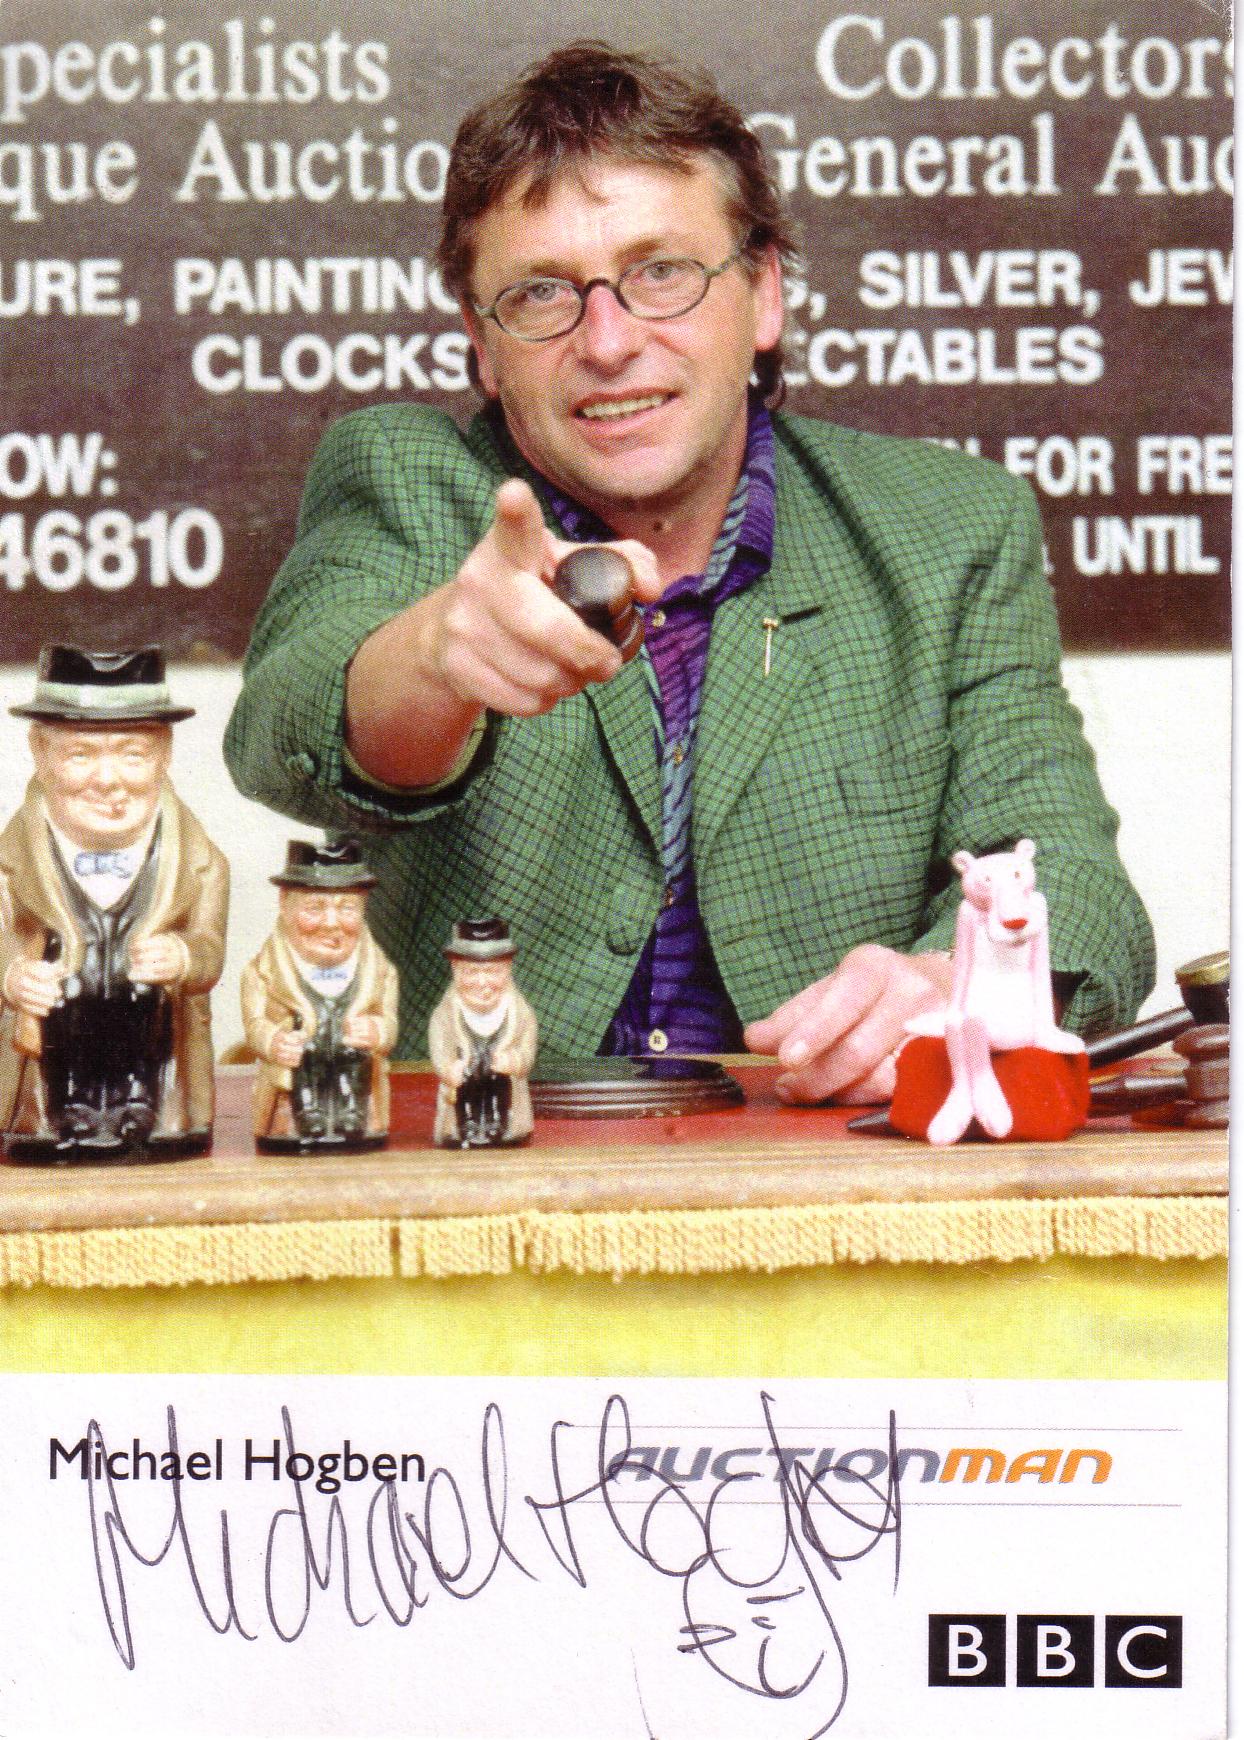 Michael Hogben net worth